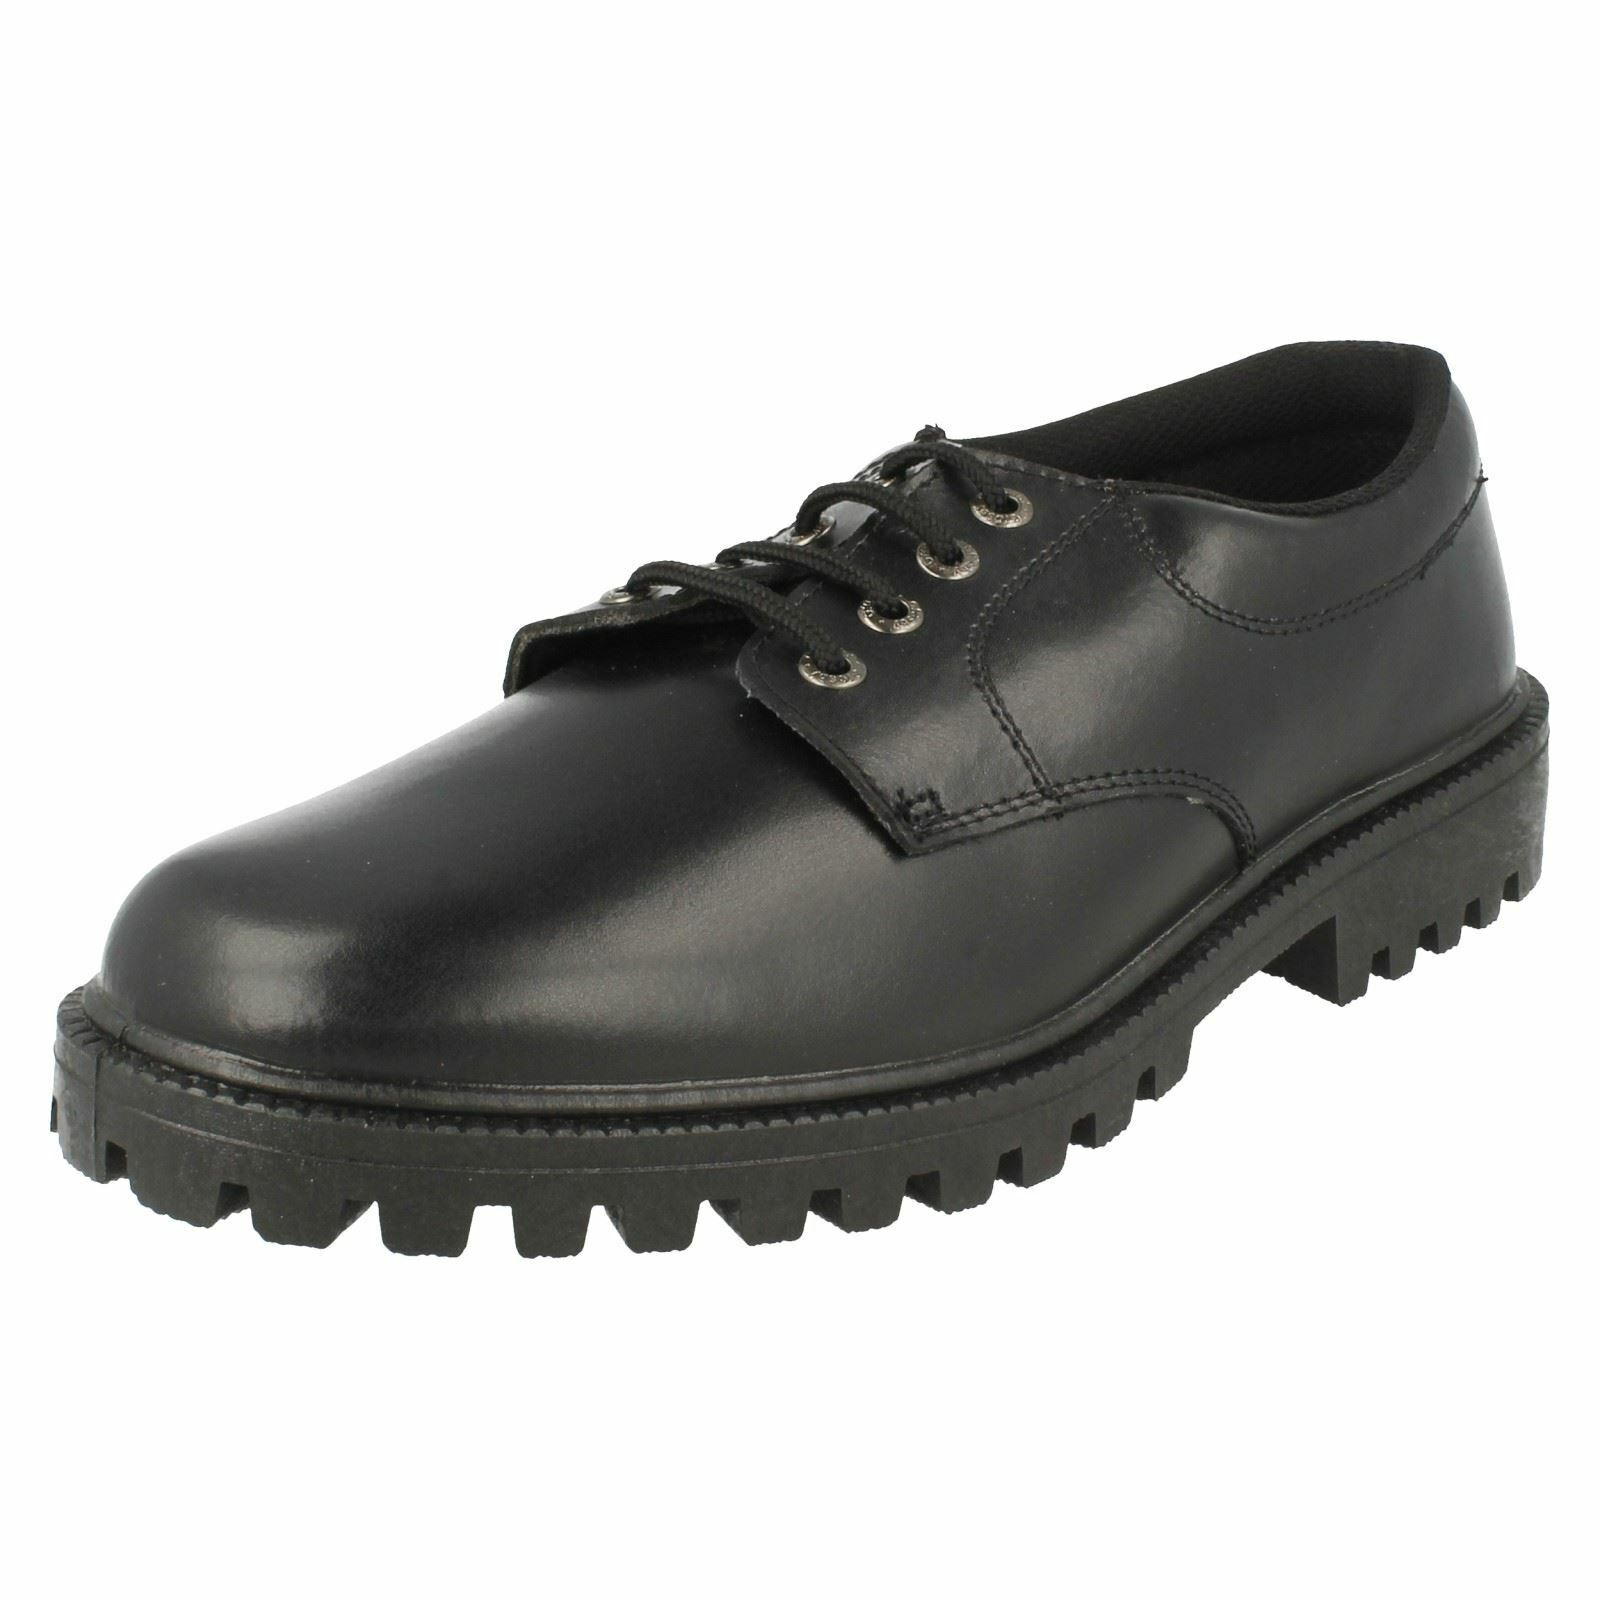 grosby 19058 cordón para de cuero para cordón hombre zapato 5a0c68